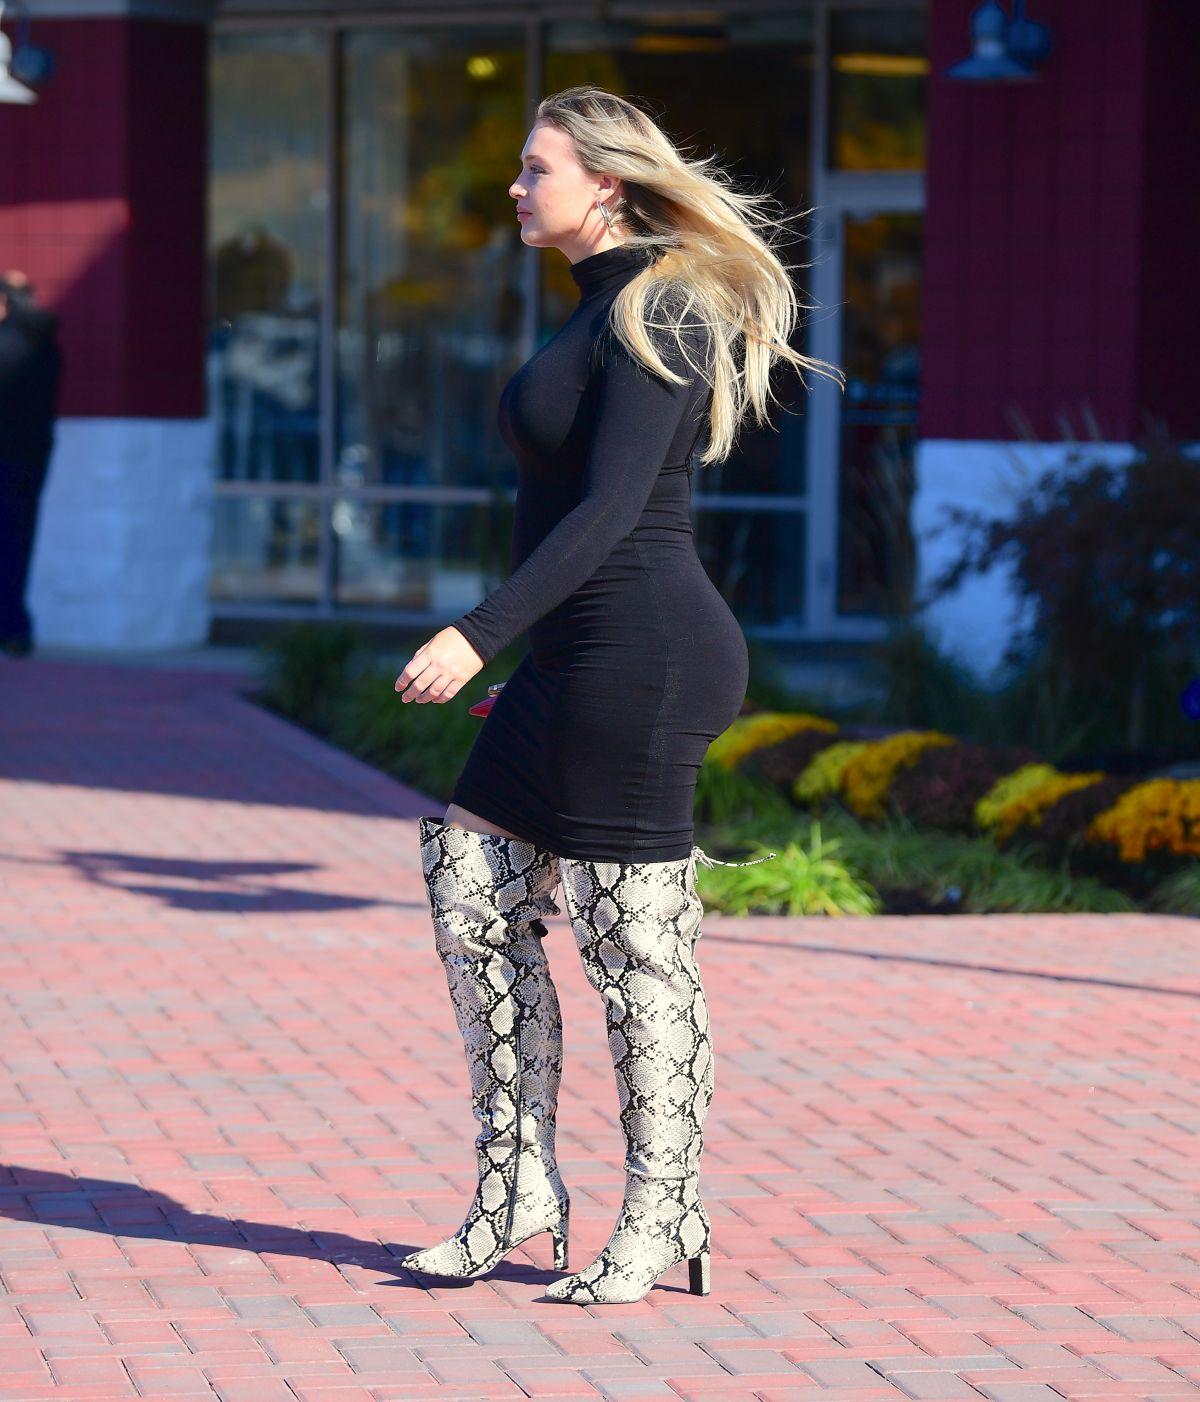 Fashion Nail Beauty Spa Elizabeth Nj: ISKRA LAWRENCE Leaves Nail Salon In New Jersey 11/04/2019